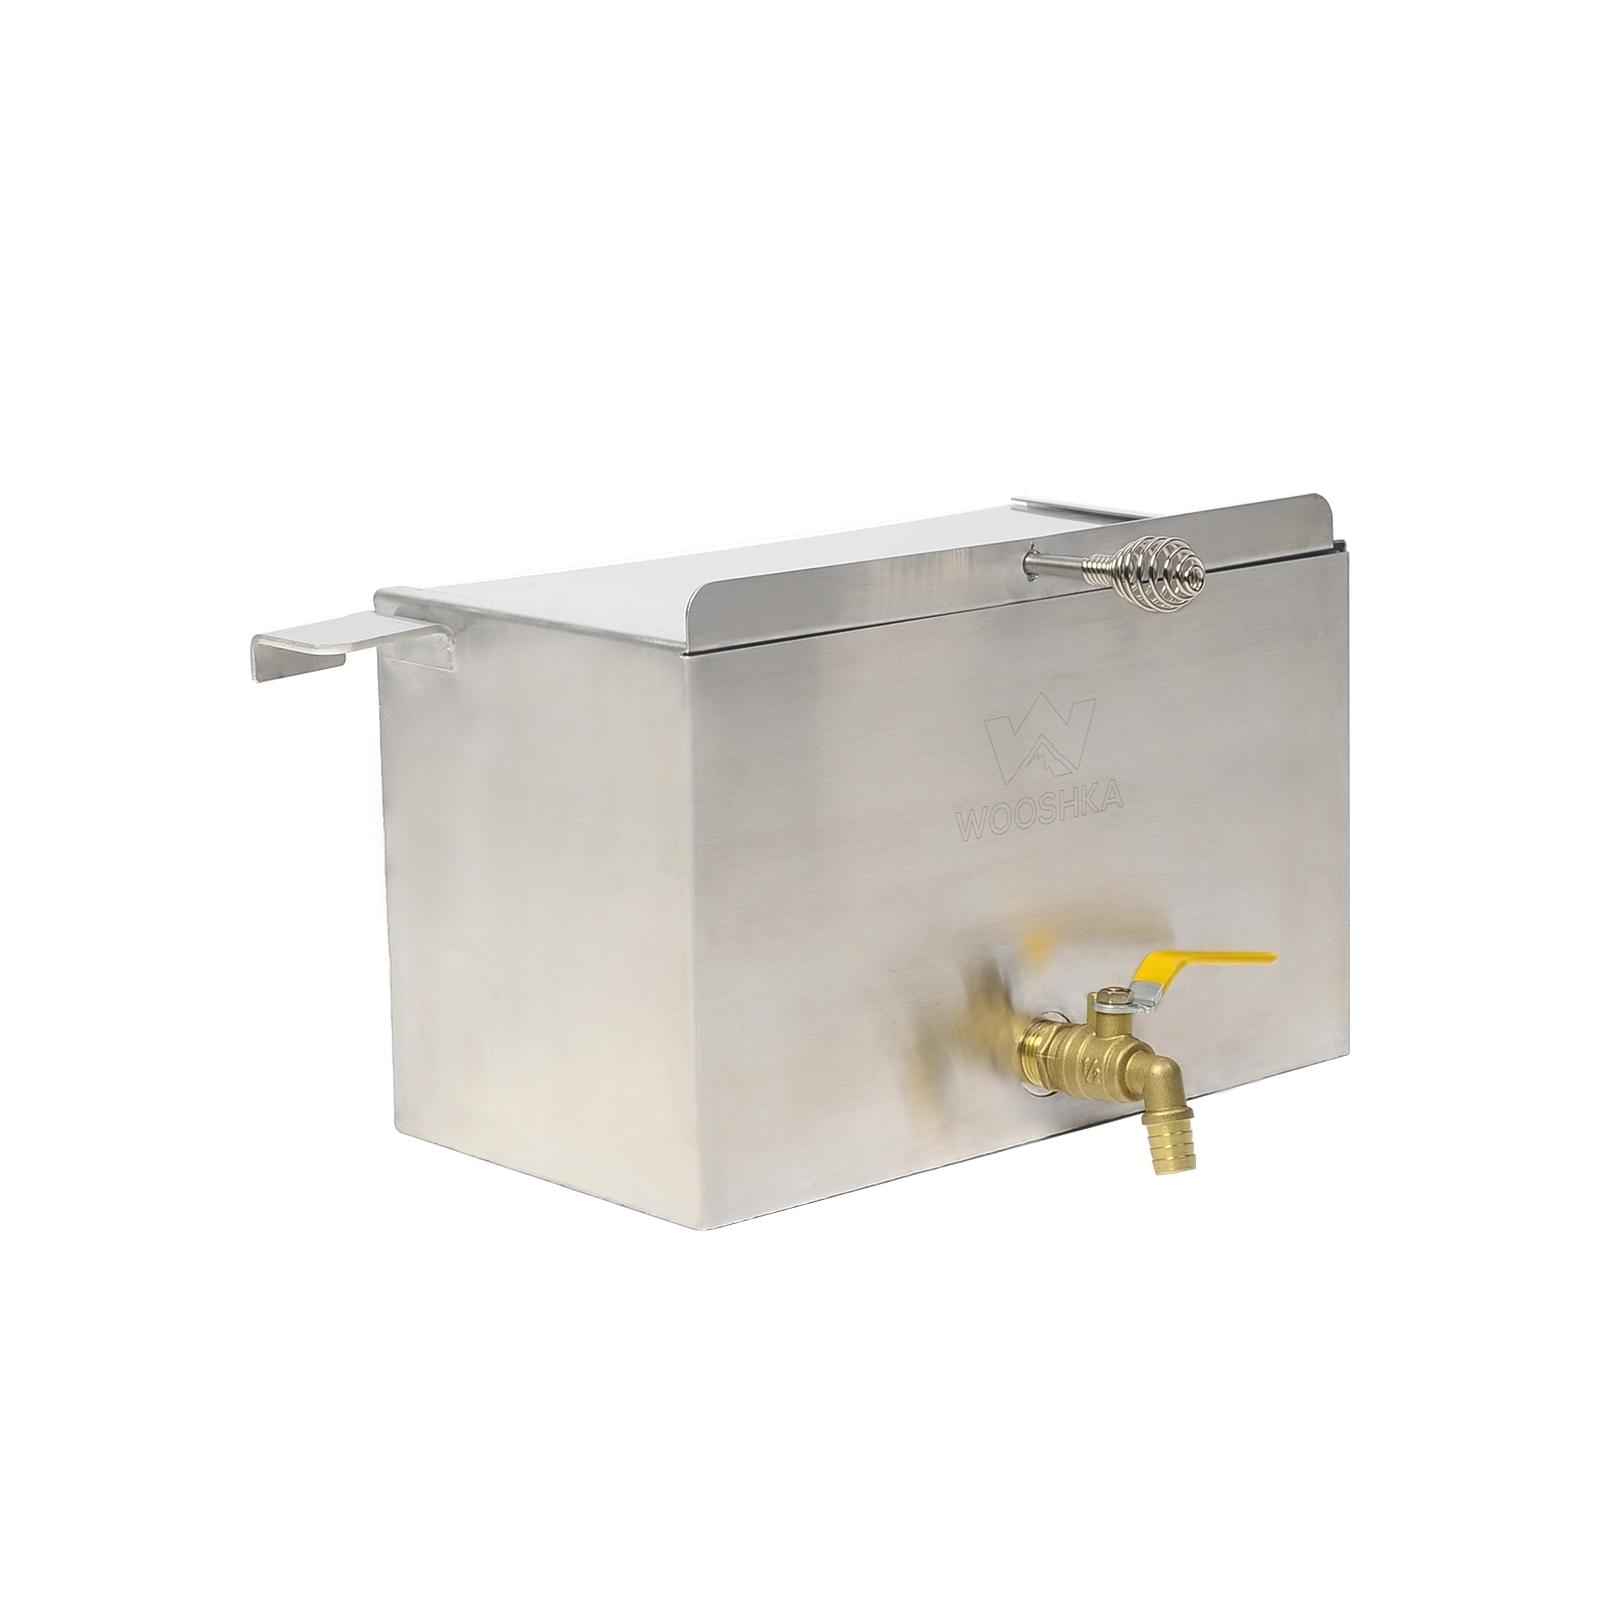 Wooshka Hot Water Boiler